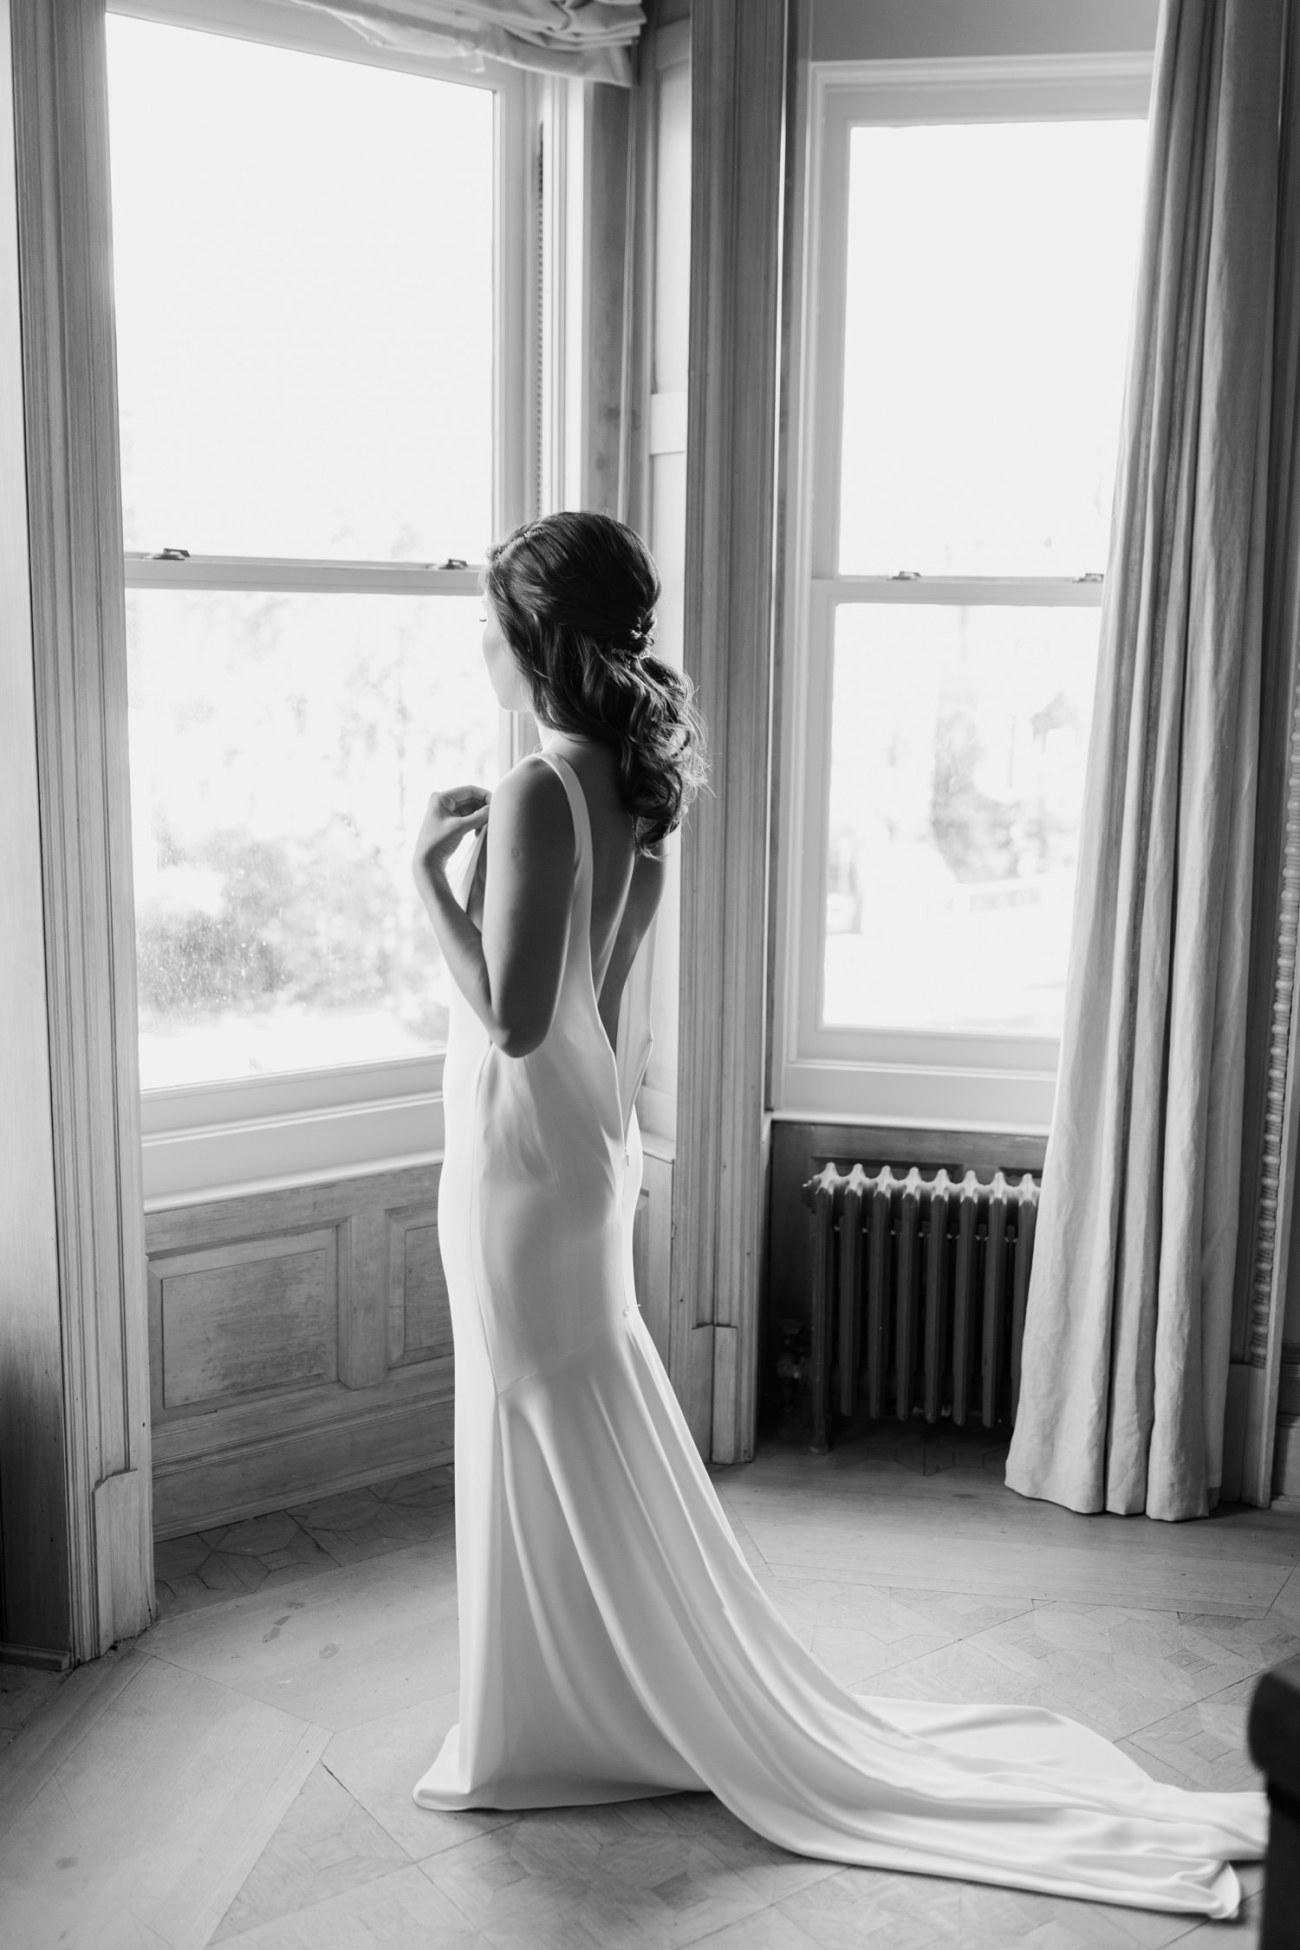 Brooklyn Brownstone House Backyard Wedding New York Wedding Photographer Anais Possamai Photography 04